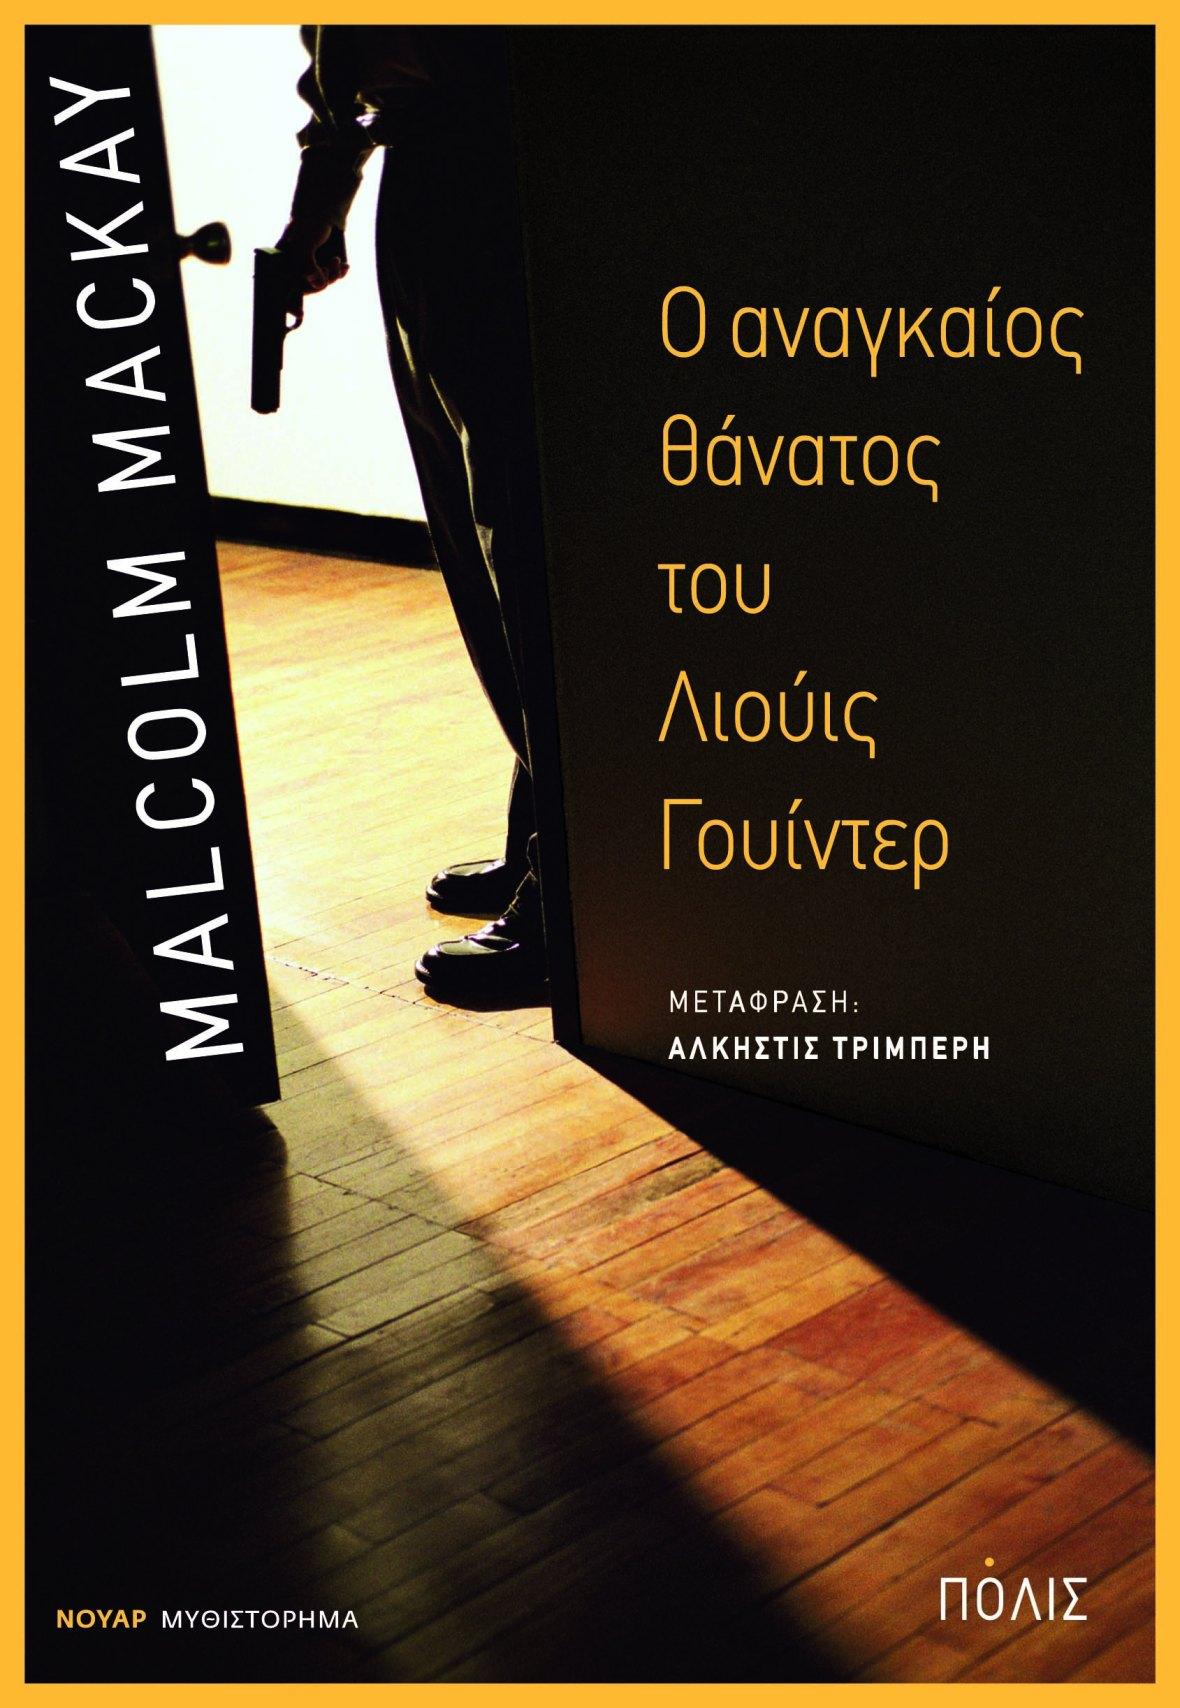 ex_O ANAGAIOS_Mackay_